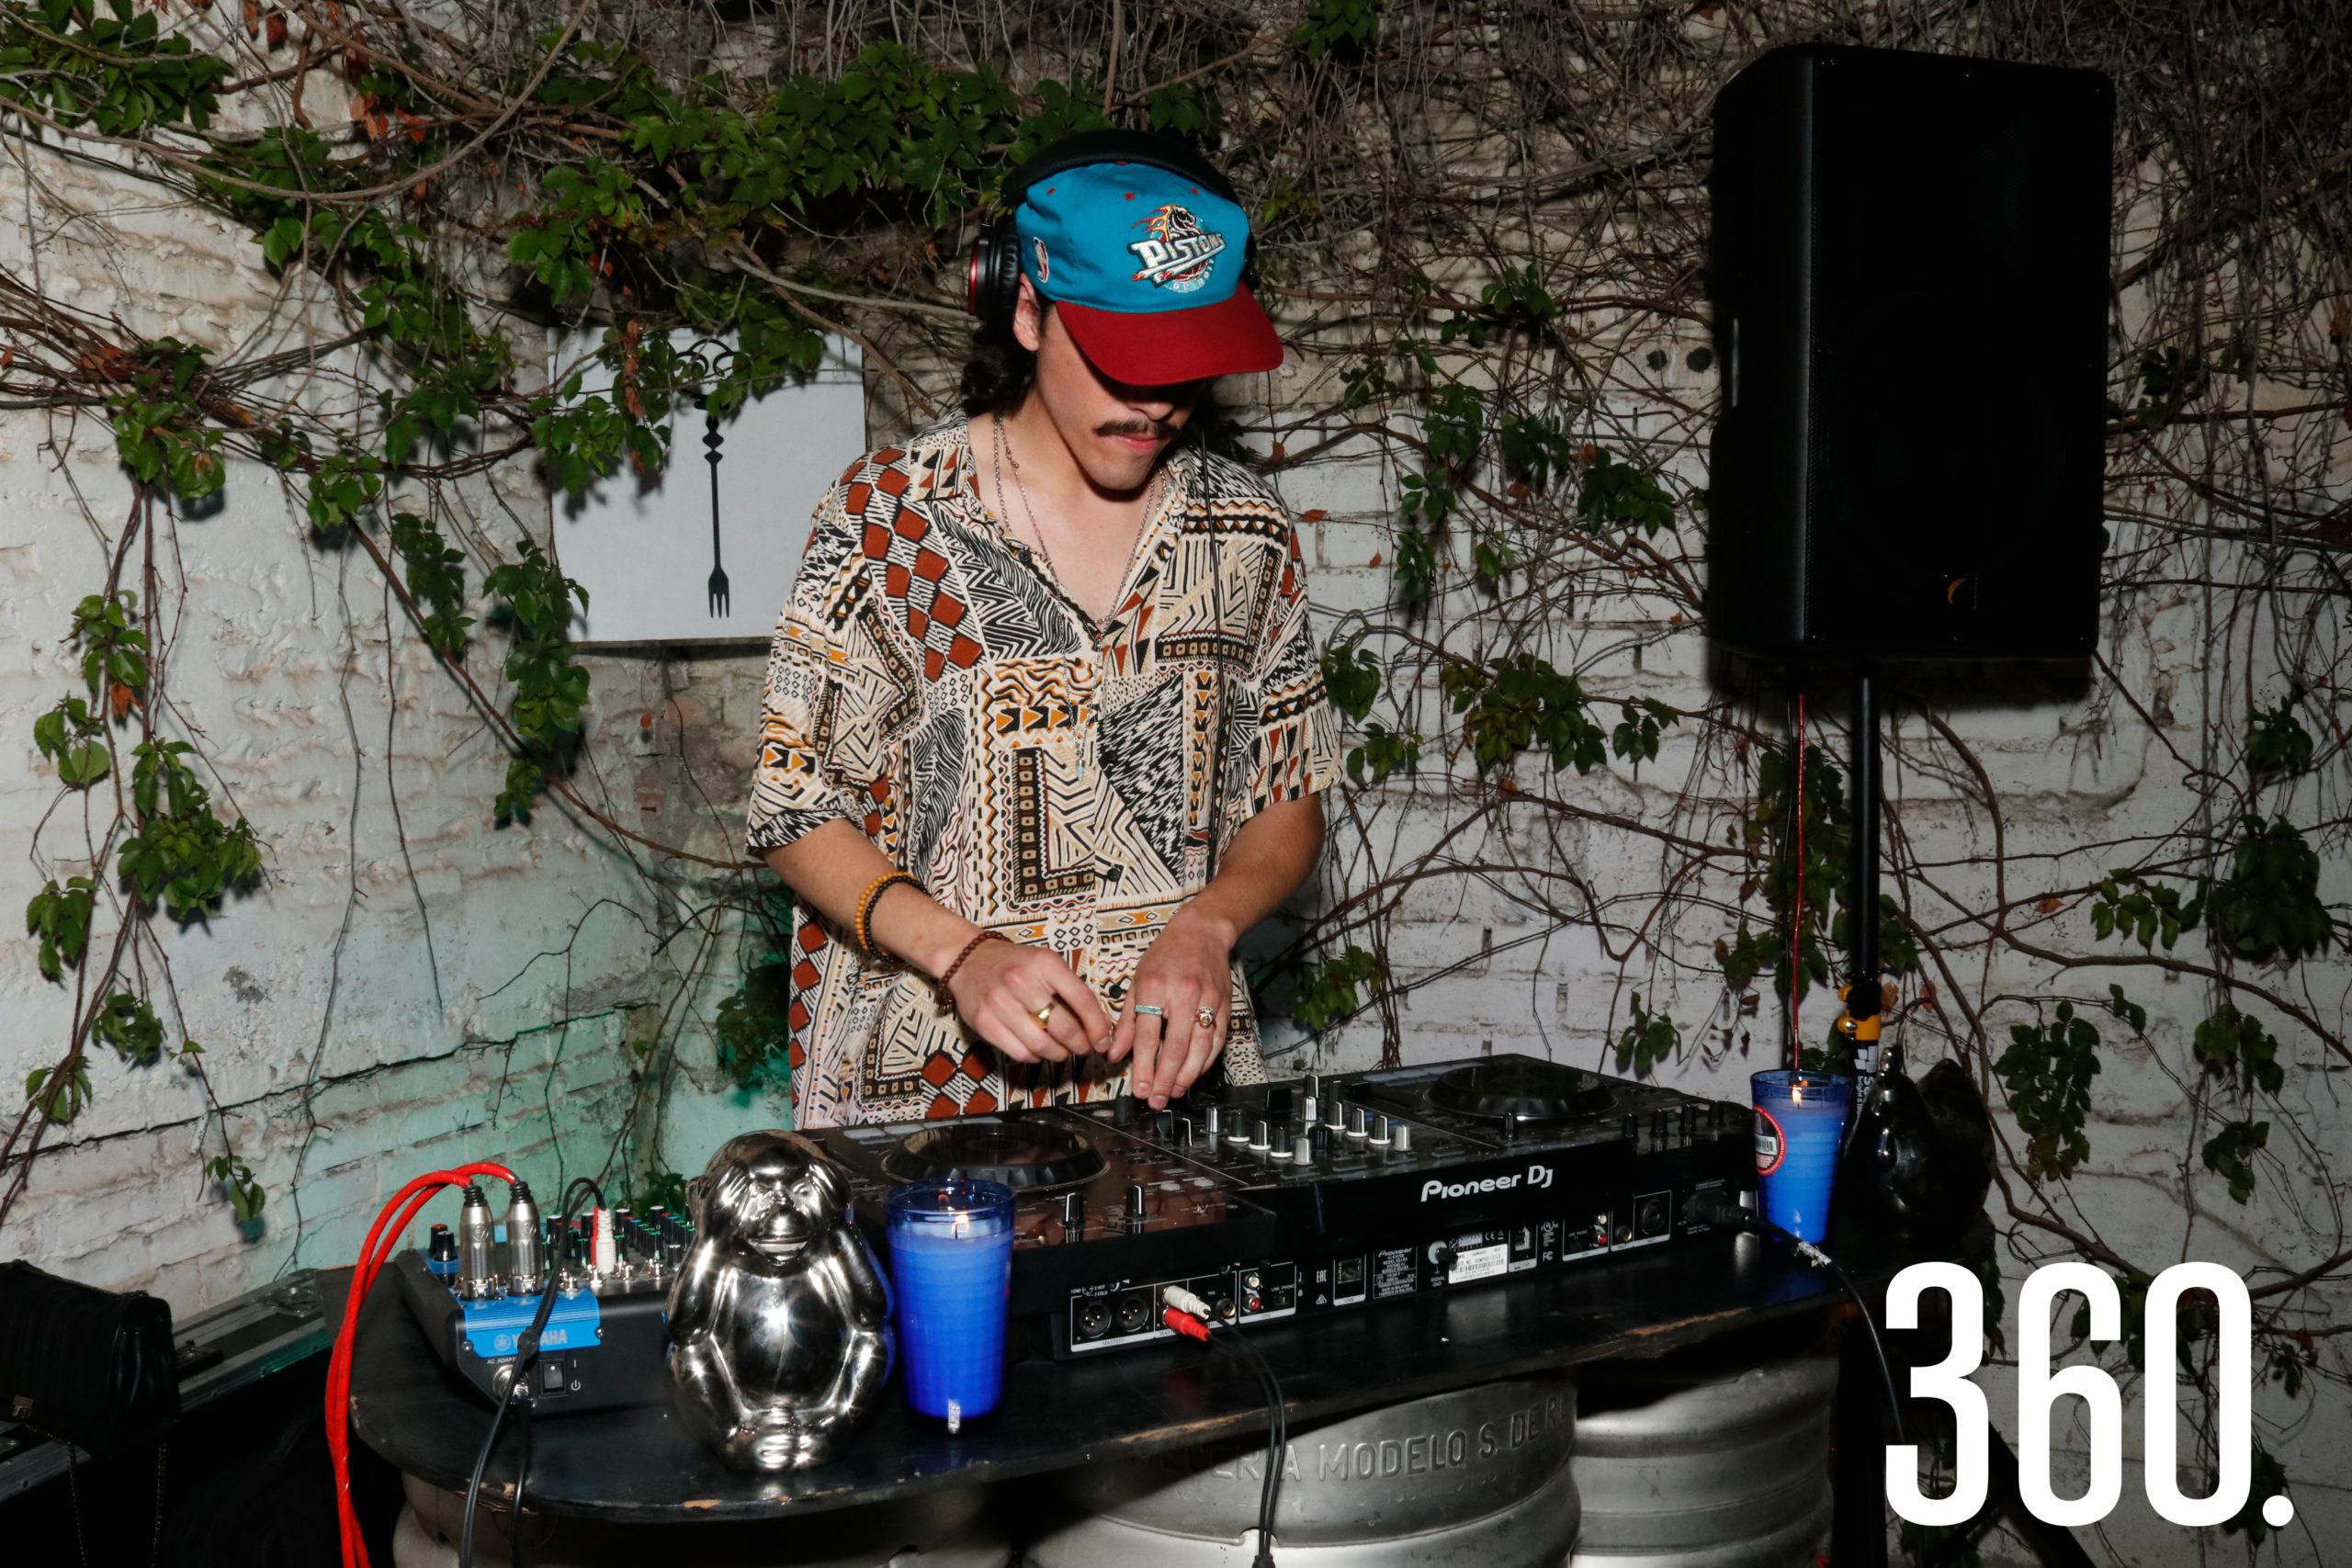 DJ Diego, integrante del grupo Pjama, amenizó la primera parte del festejo.